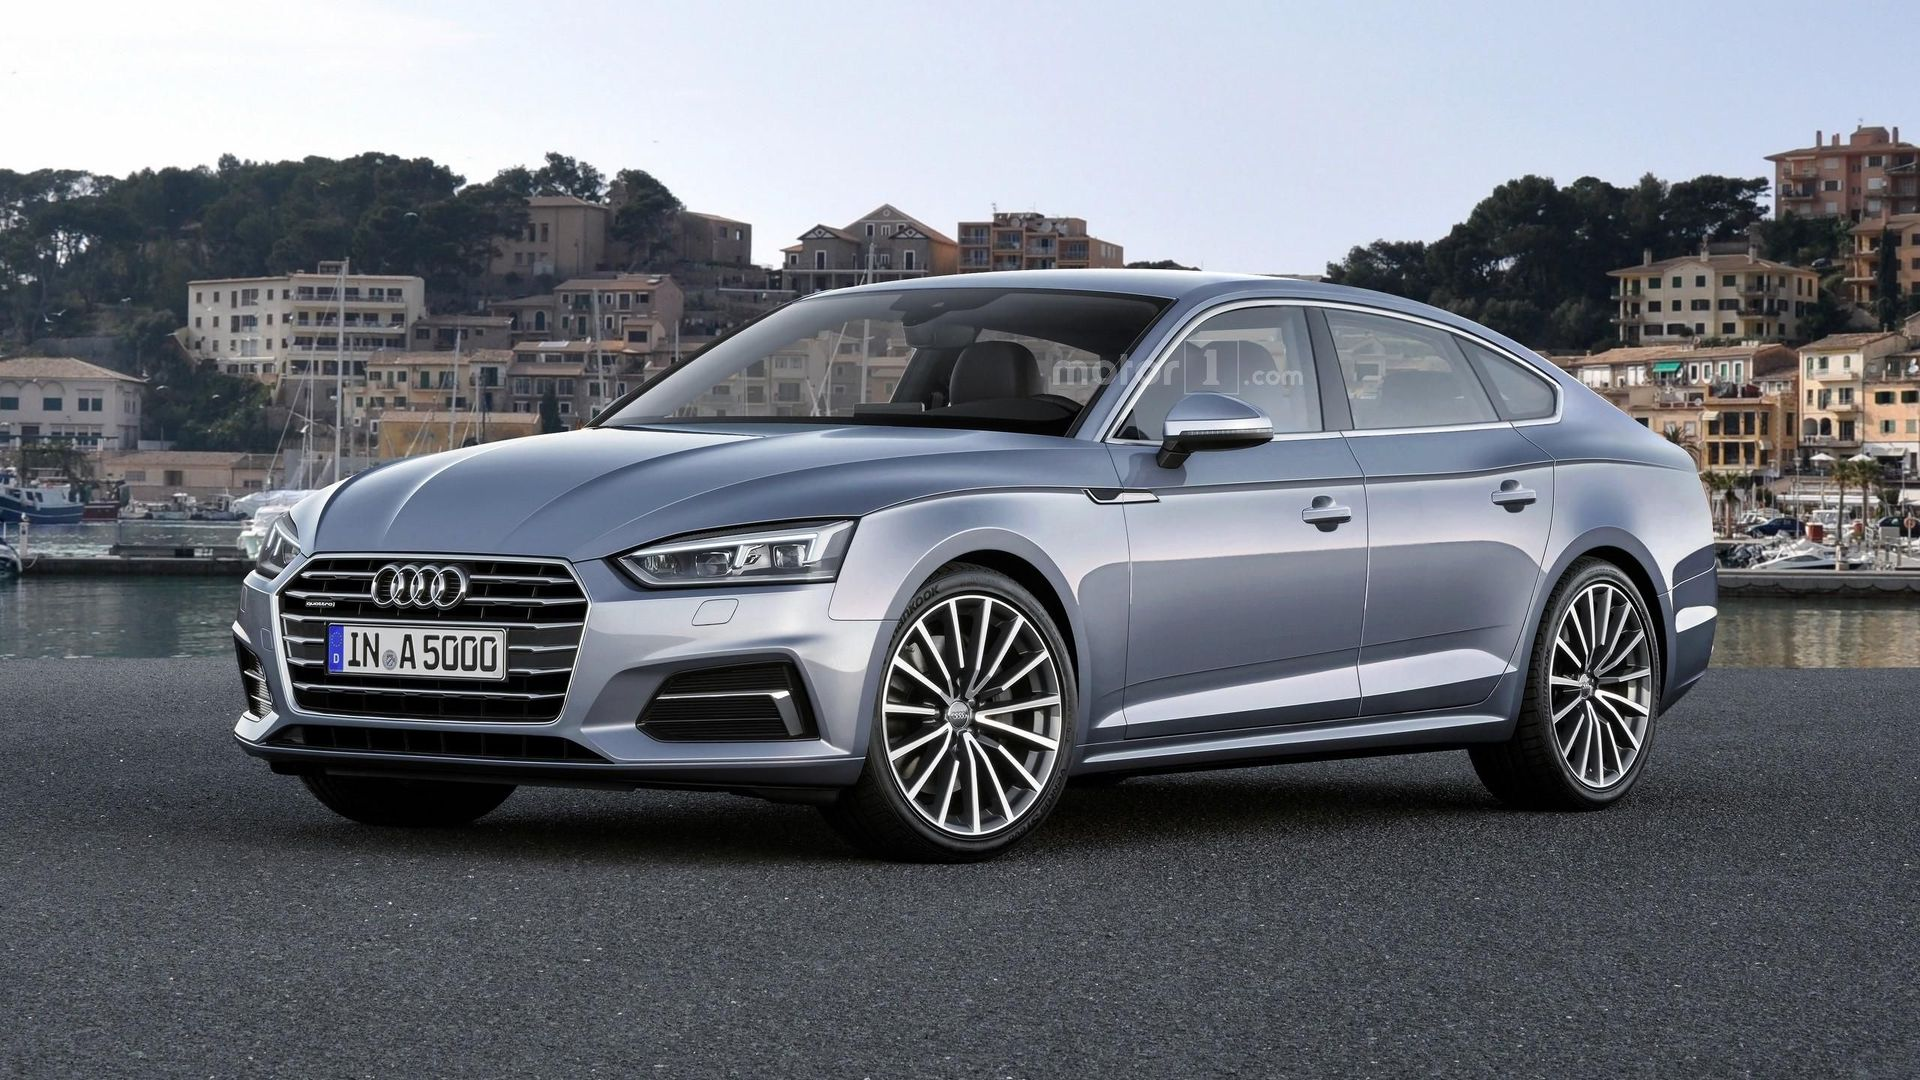 Reprogrammation Audi A5 S5 3.0 TFSI 354